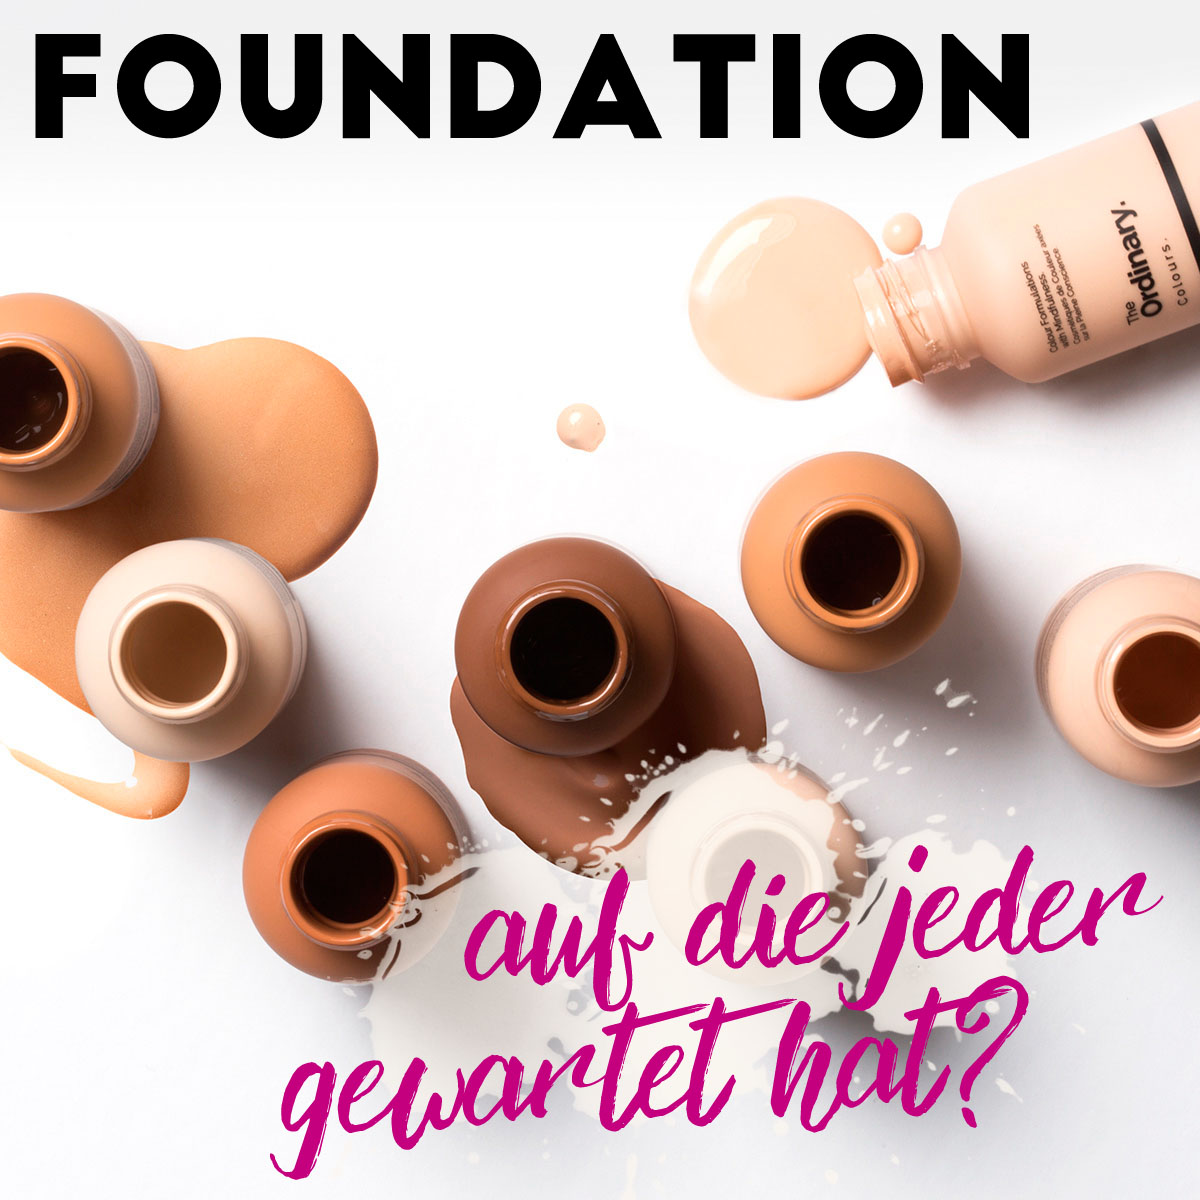 THE ORDINARY Foundation Colour Makeup DECIEM kaufen Deutschland